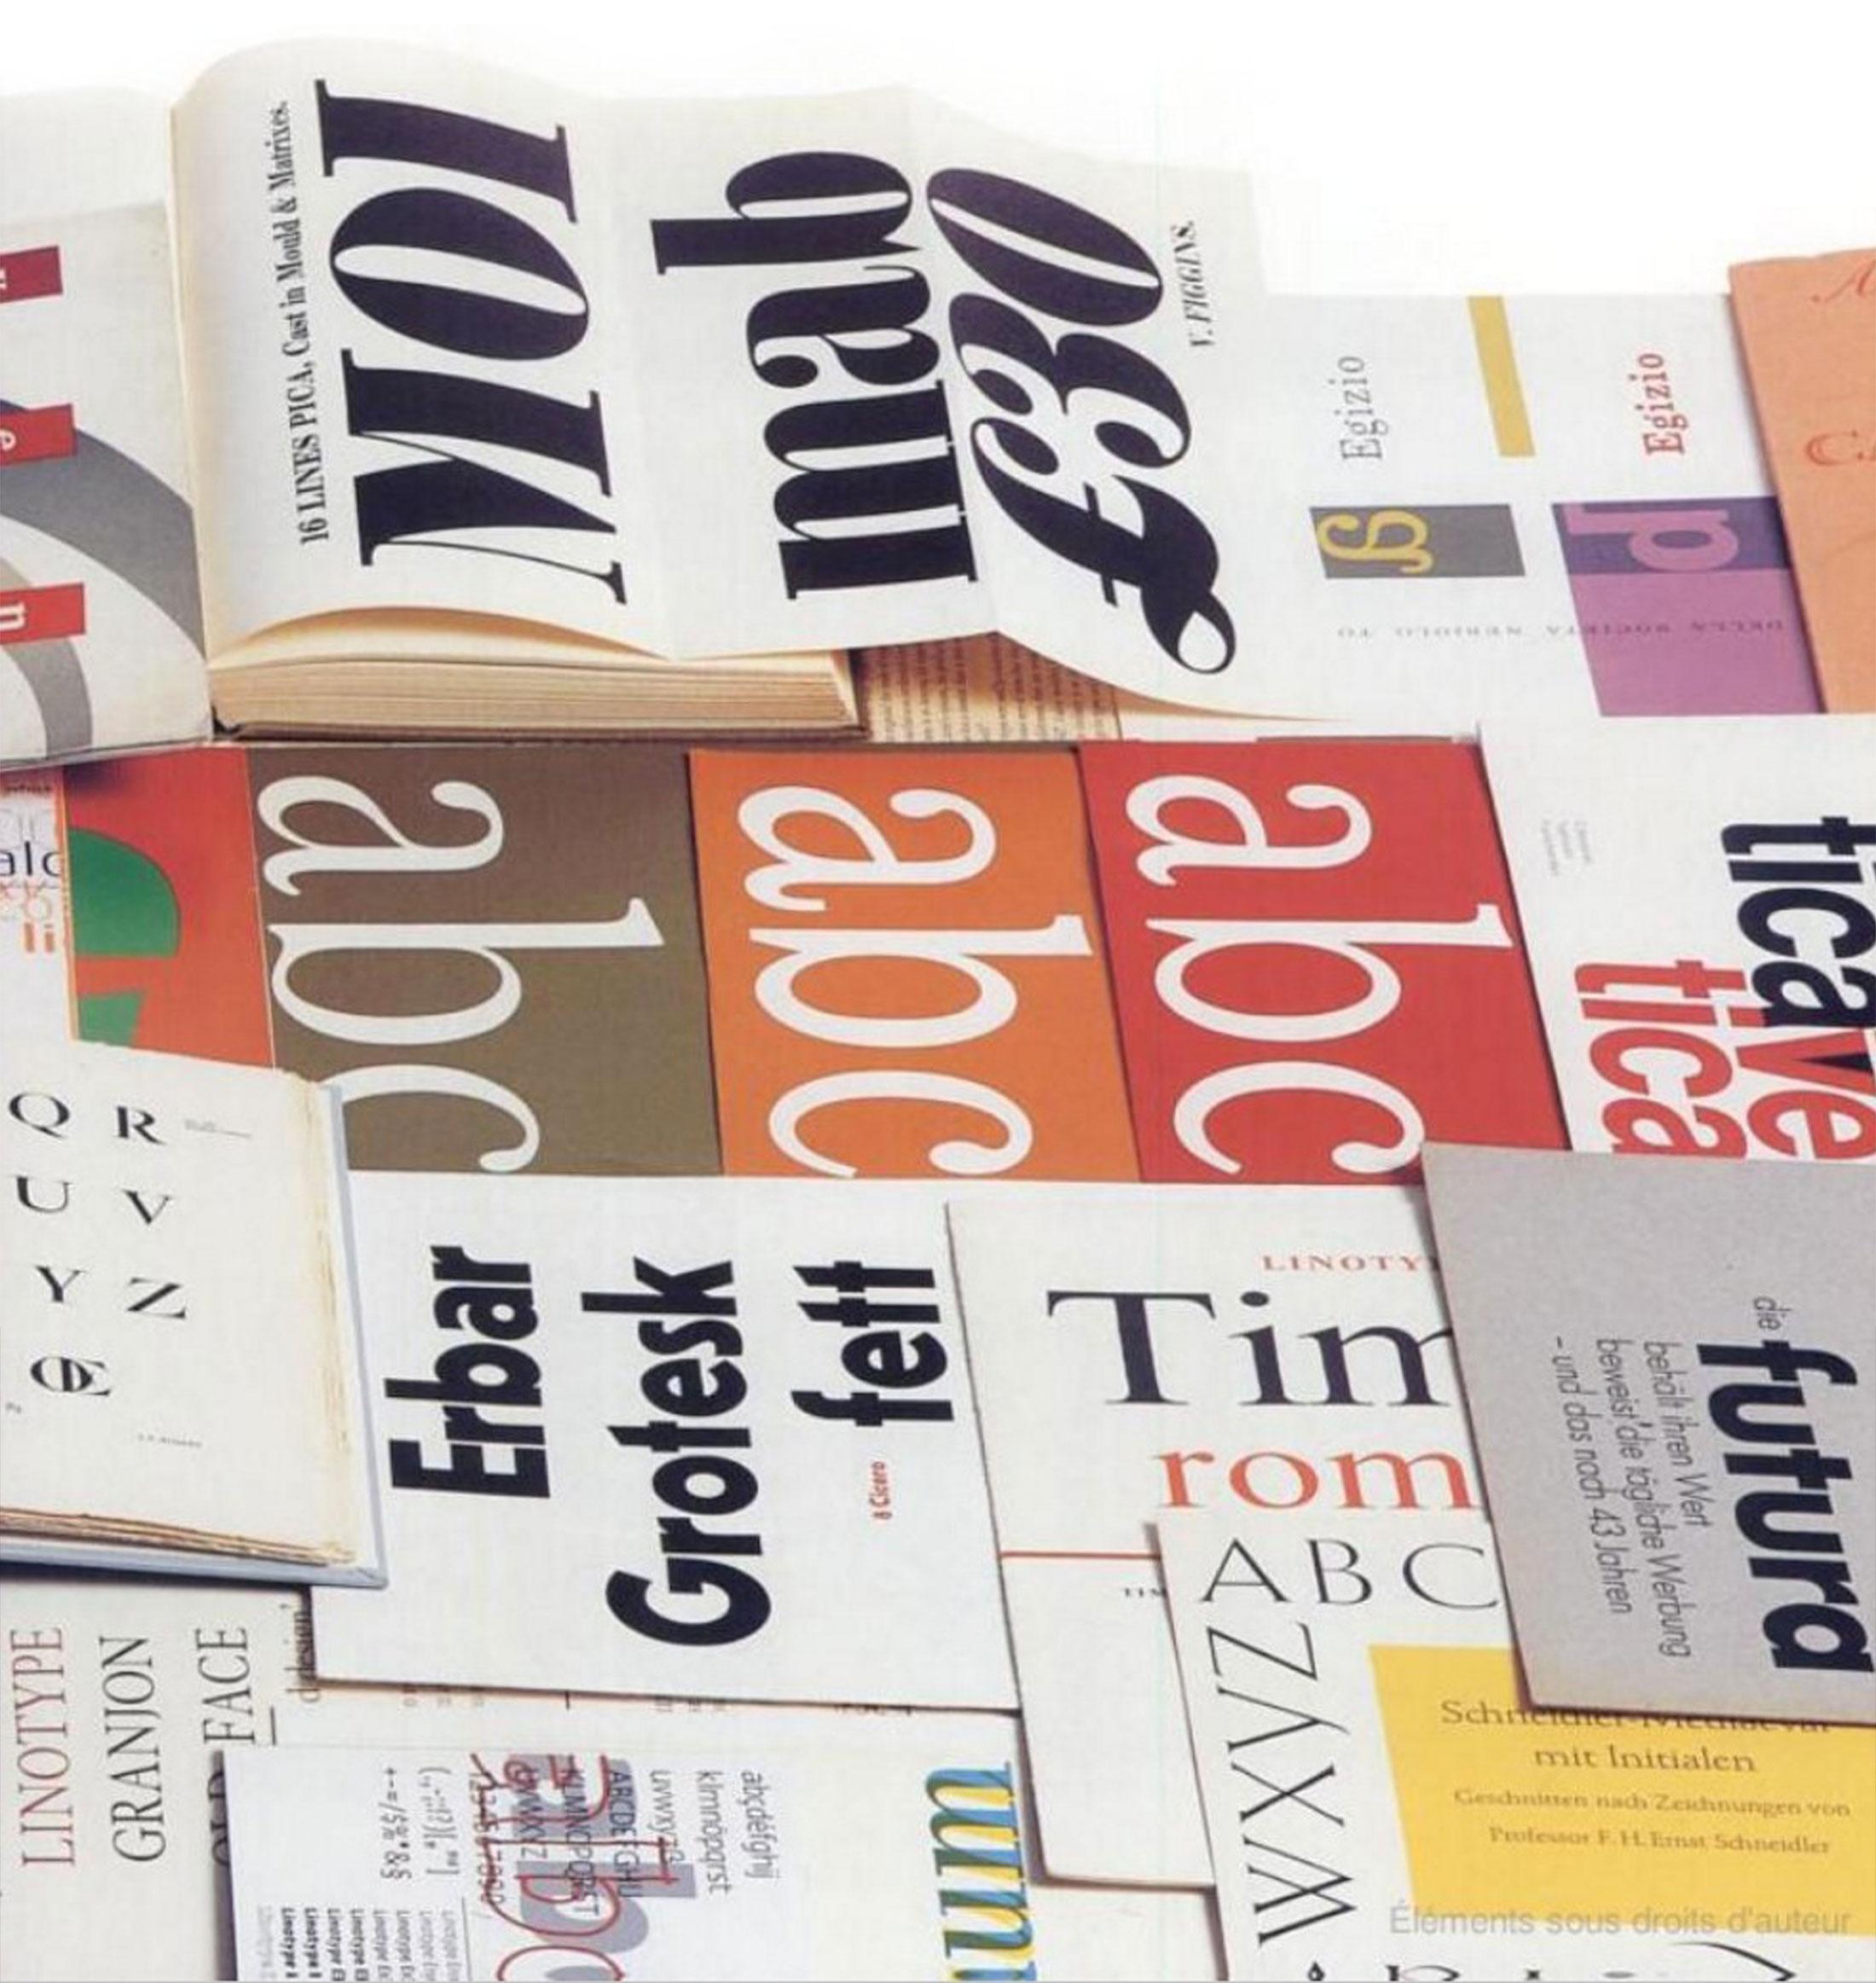 An-A-Z-of-Type-Designers-Neil-Macmillan-bibliotheque-index-grafik